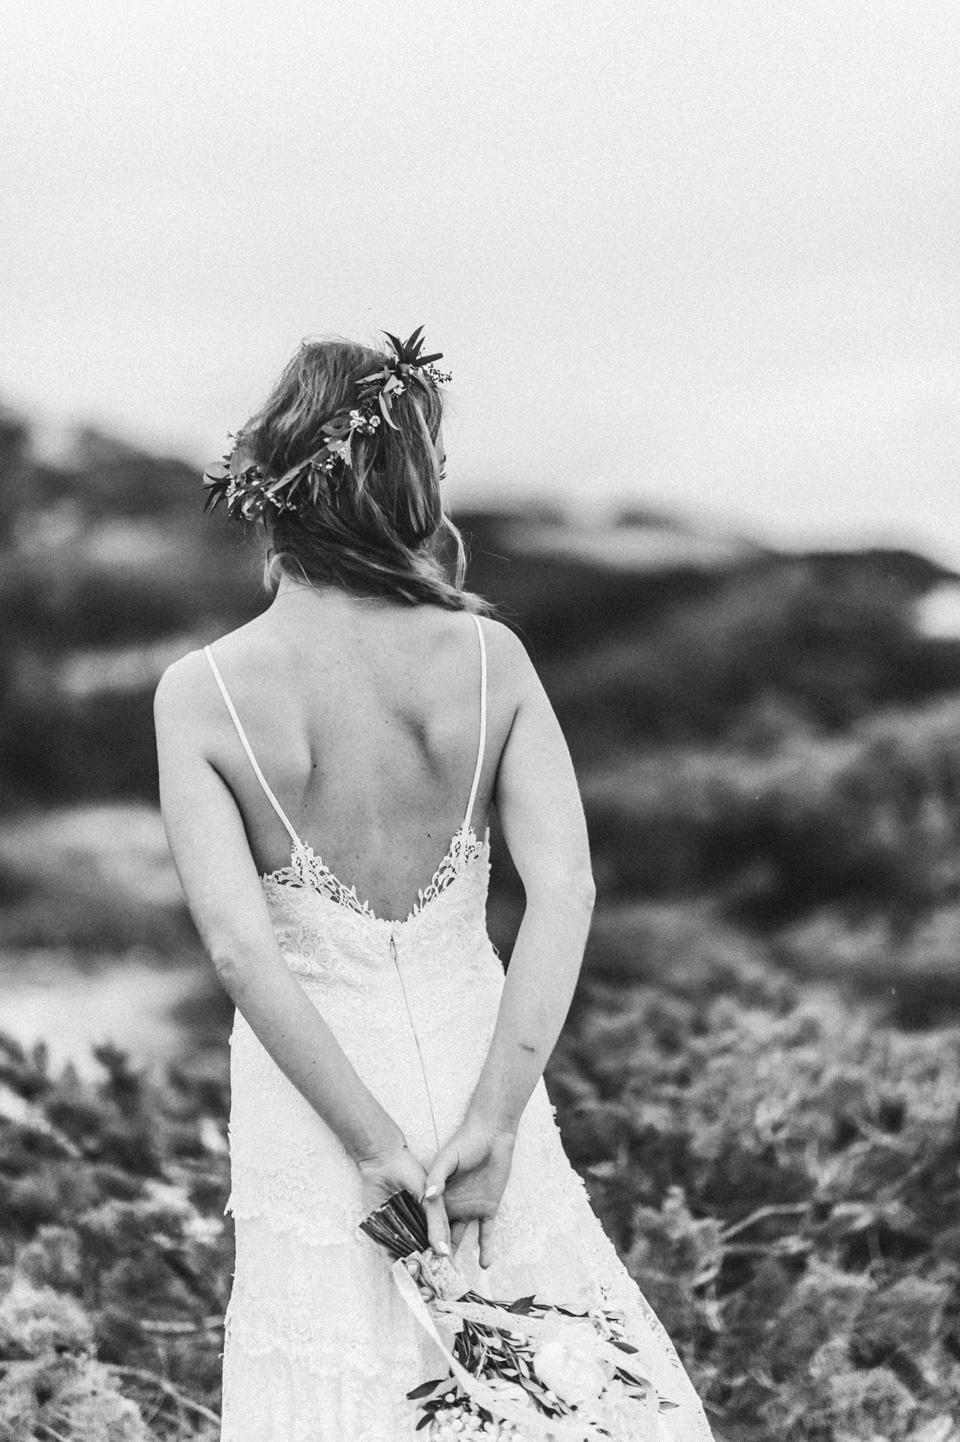 bohemian-ibiza-kreativ-wedding_0132 hochzeitsfotograf hochzeitsvideo ibiza bohemian weddingSaskia & Pierre Bohemian Bohemian Ibiza Weddingbohemian ibiza kreativ wedding 0132